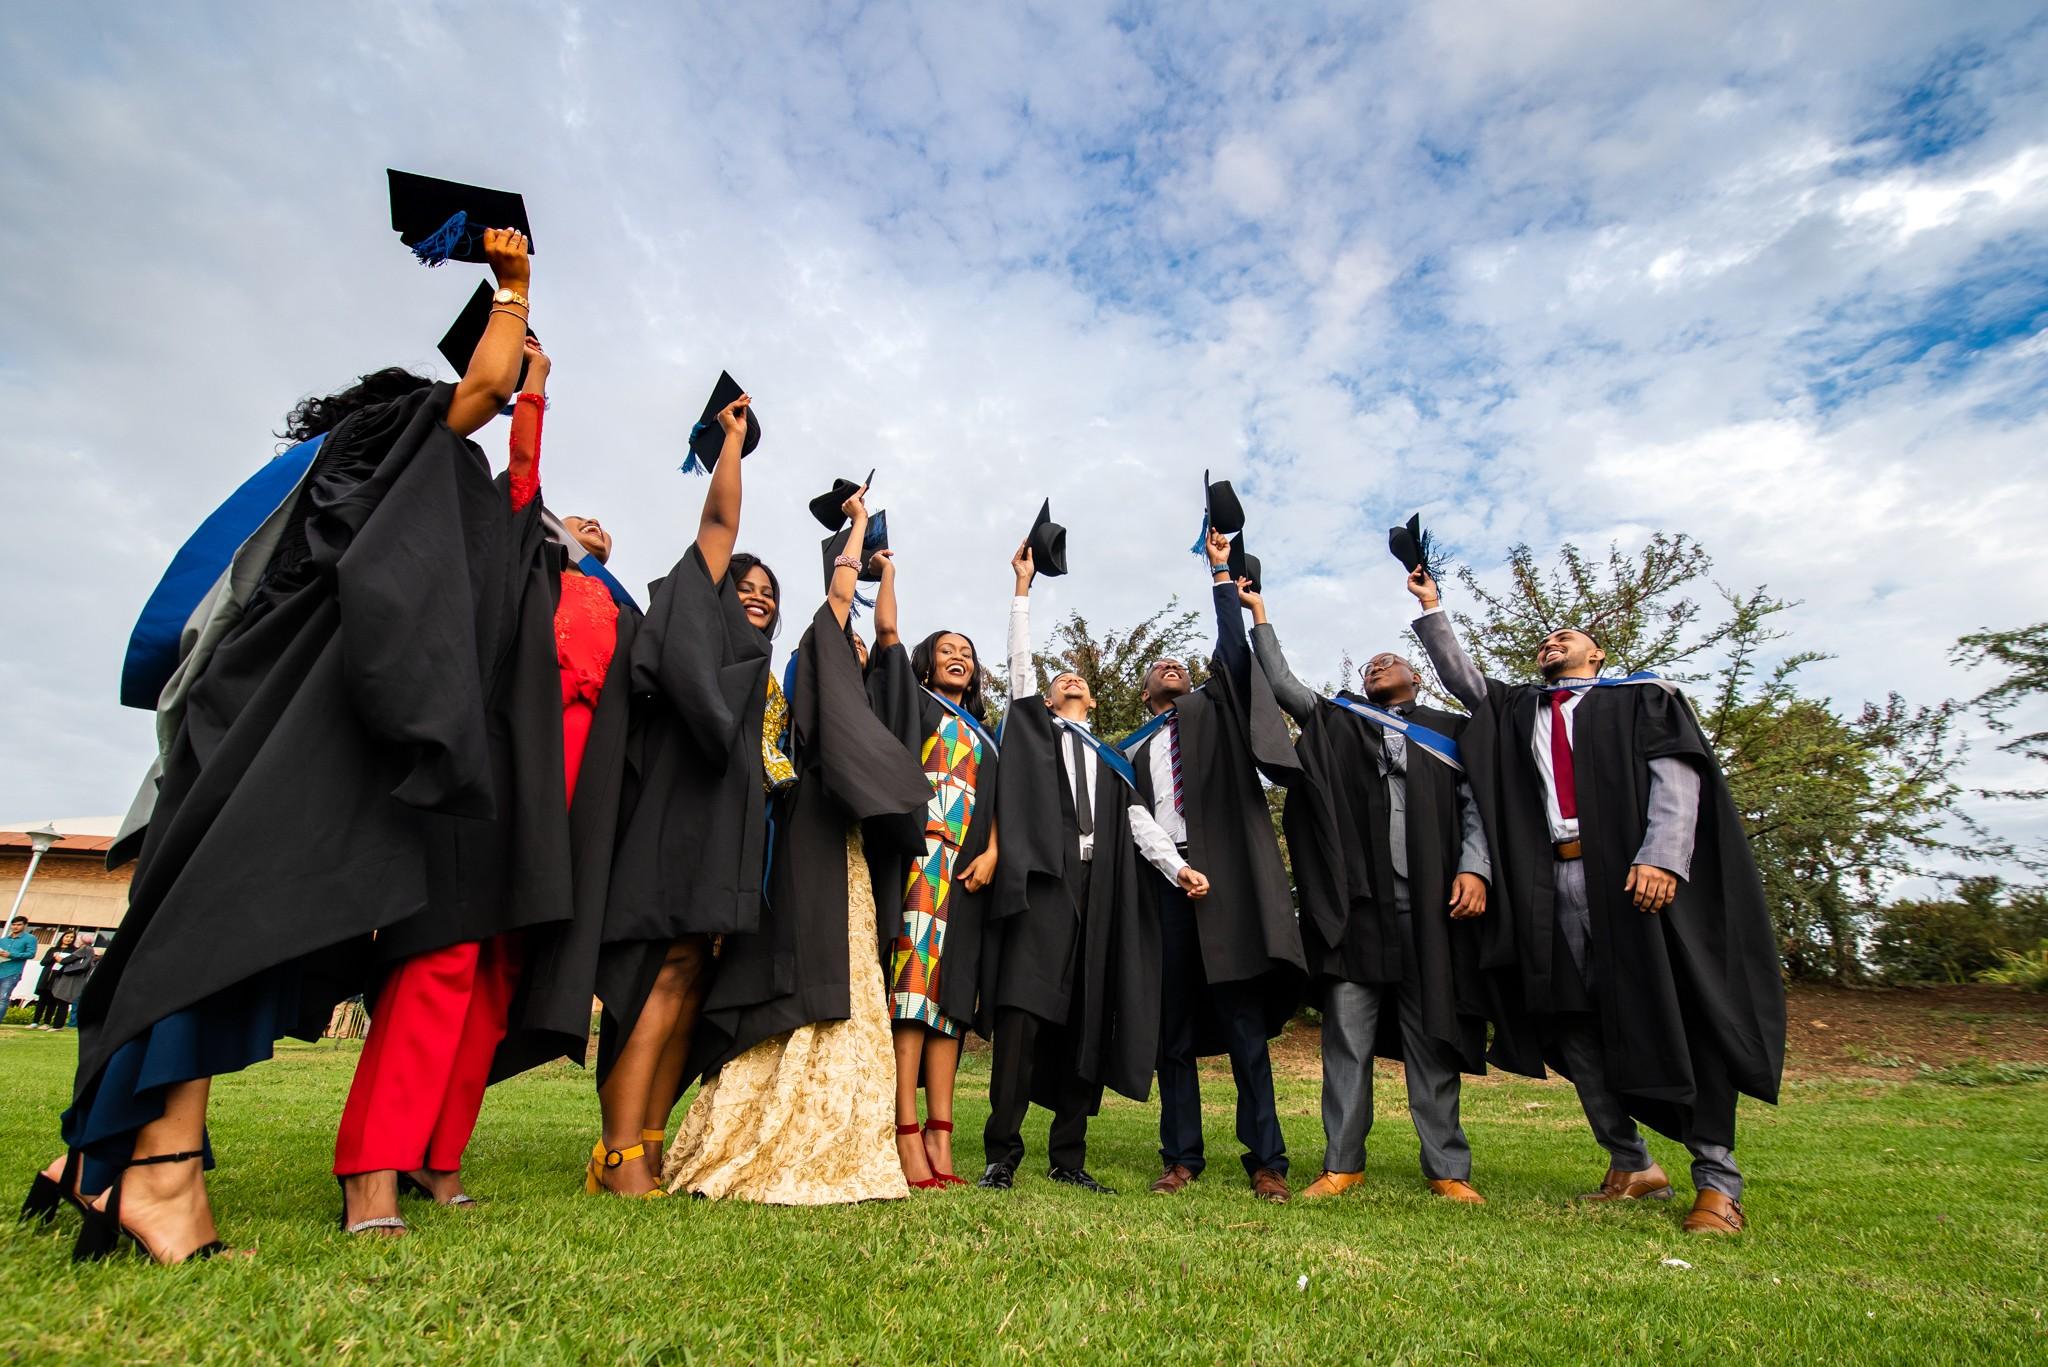 University Of Pretoria Universiteit Van Pretoria Mission Statement Employees And Hiring Linkedin